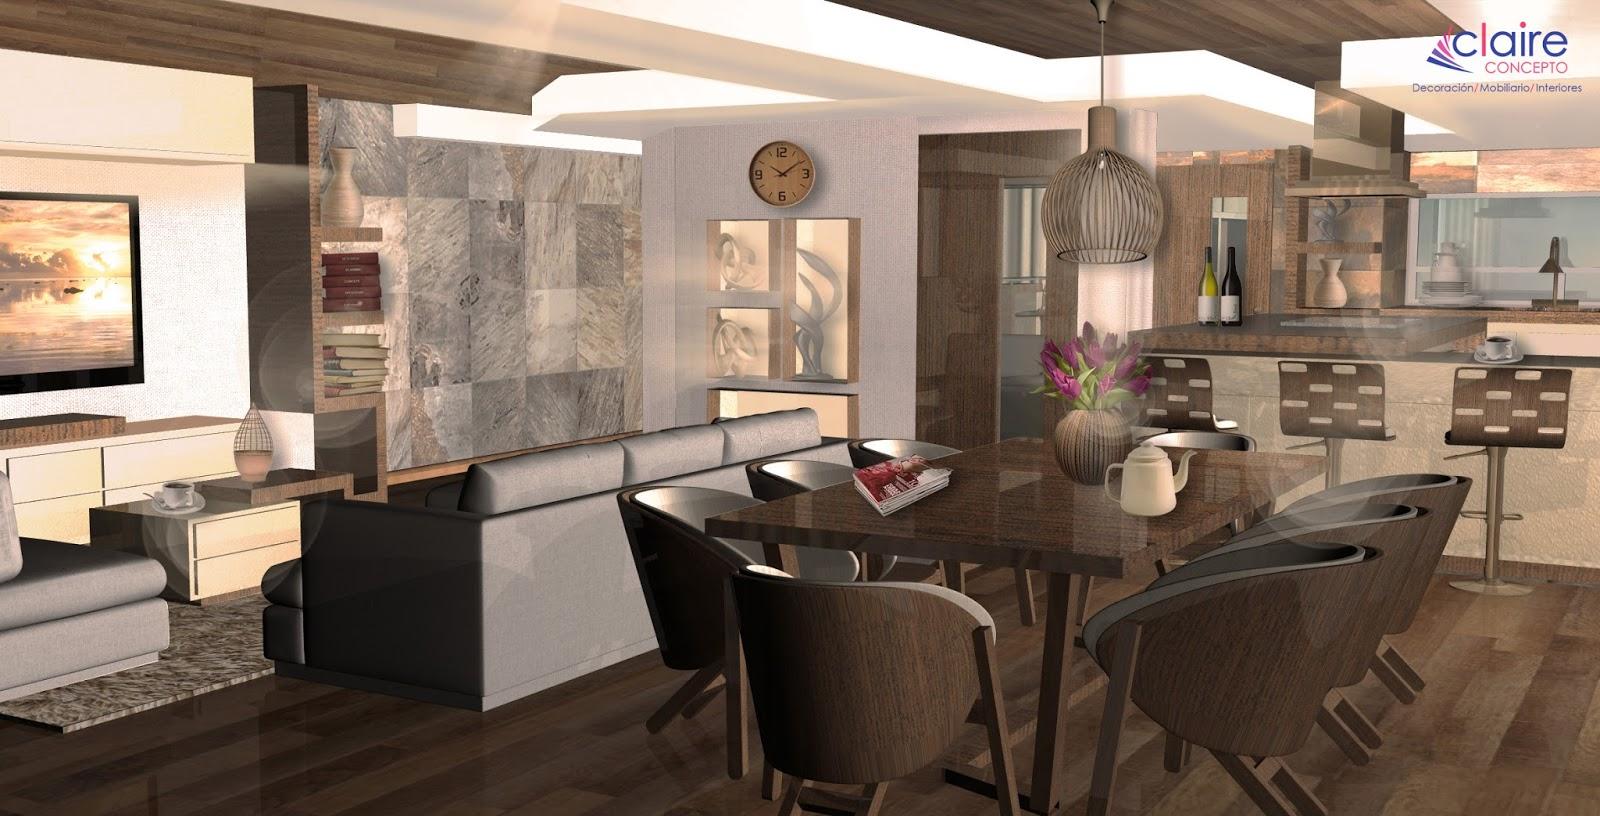 Decoraci n de interiores casas peque as interlomas for Paginas de decoracion de interiores de casas